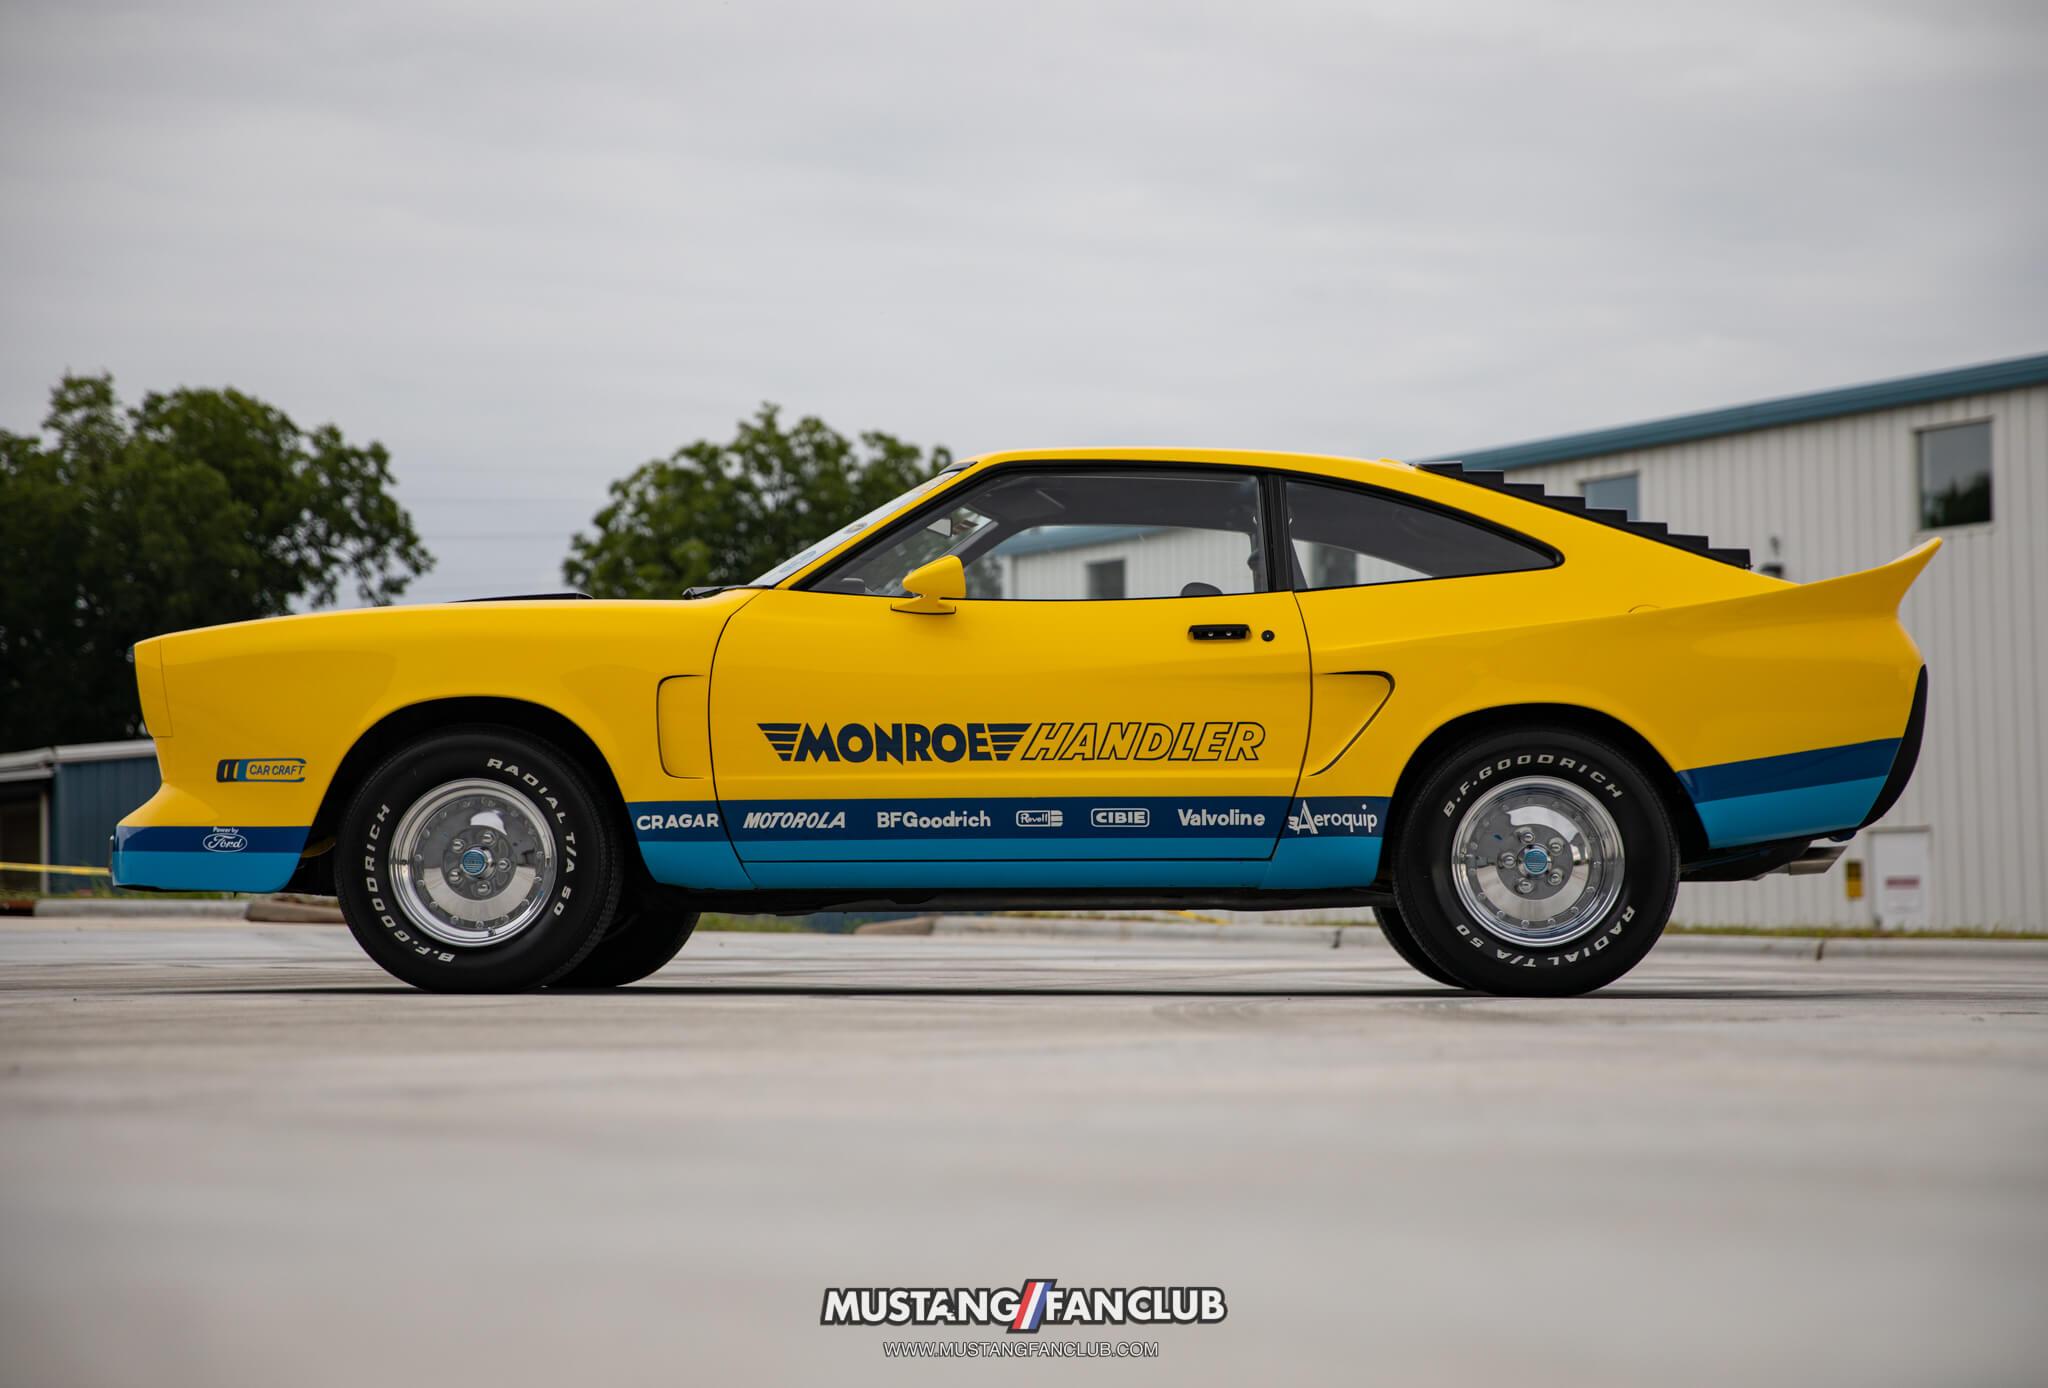 What is the Mustang ii Monroe Handler?